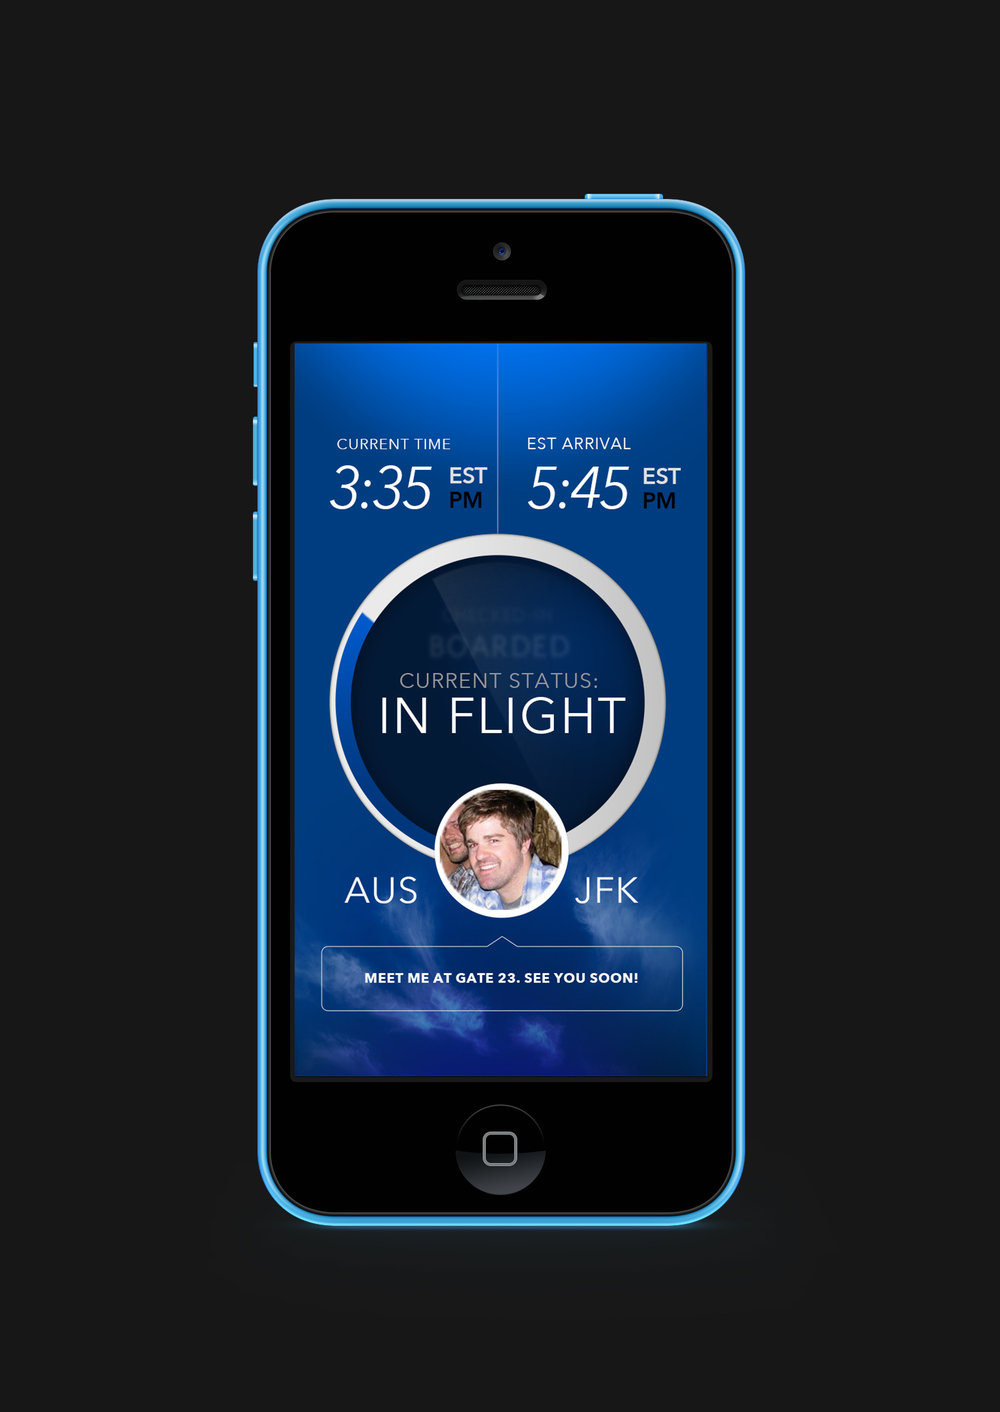 flight_tracker_iphone.jpg